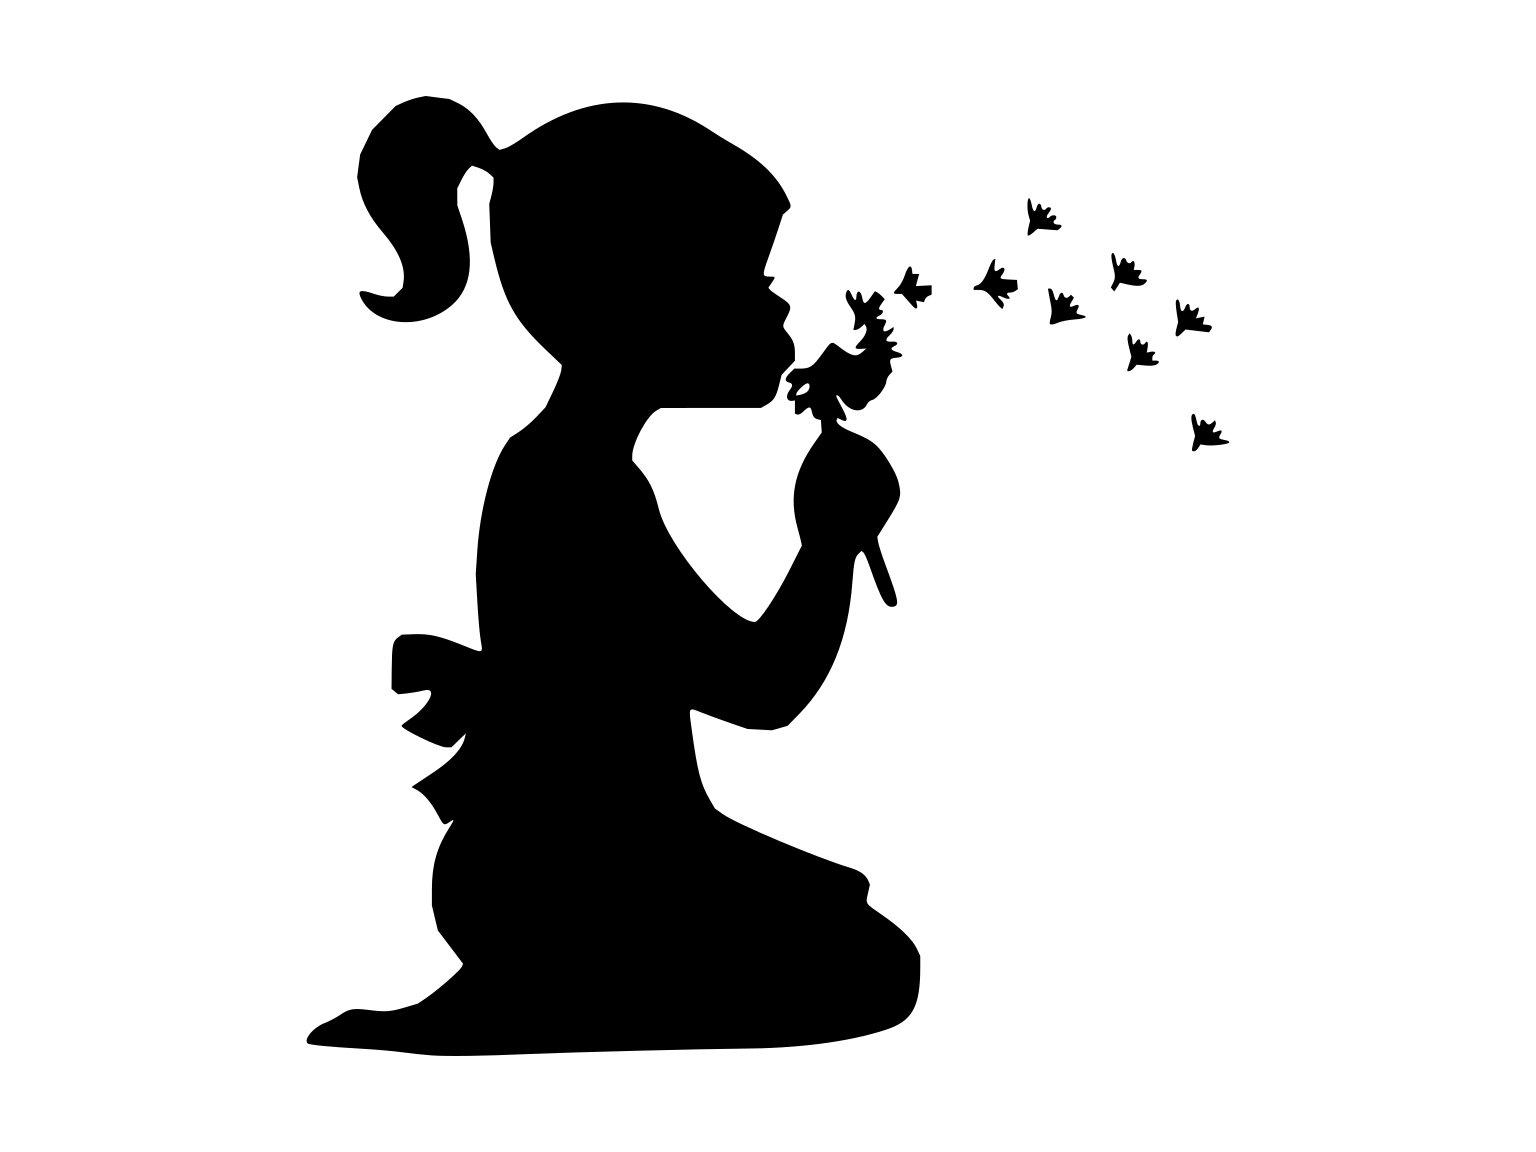 Little Girl Svg Girl Child Svg Dandelion Silhouette Cutting File Clipart  Svg Dxf Png Art Cnc Laser Cut File Tshirt Vector Clip Art.